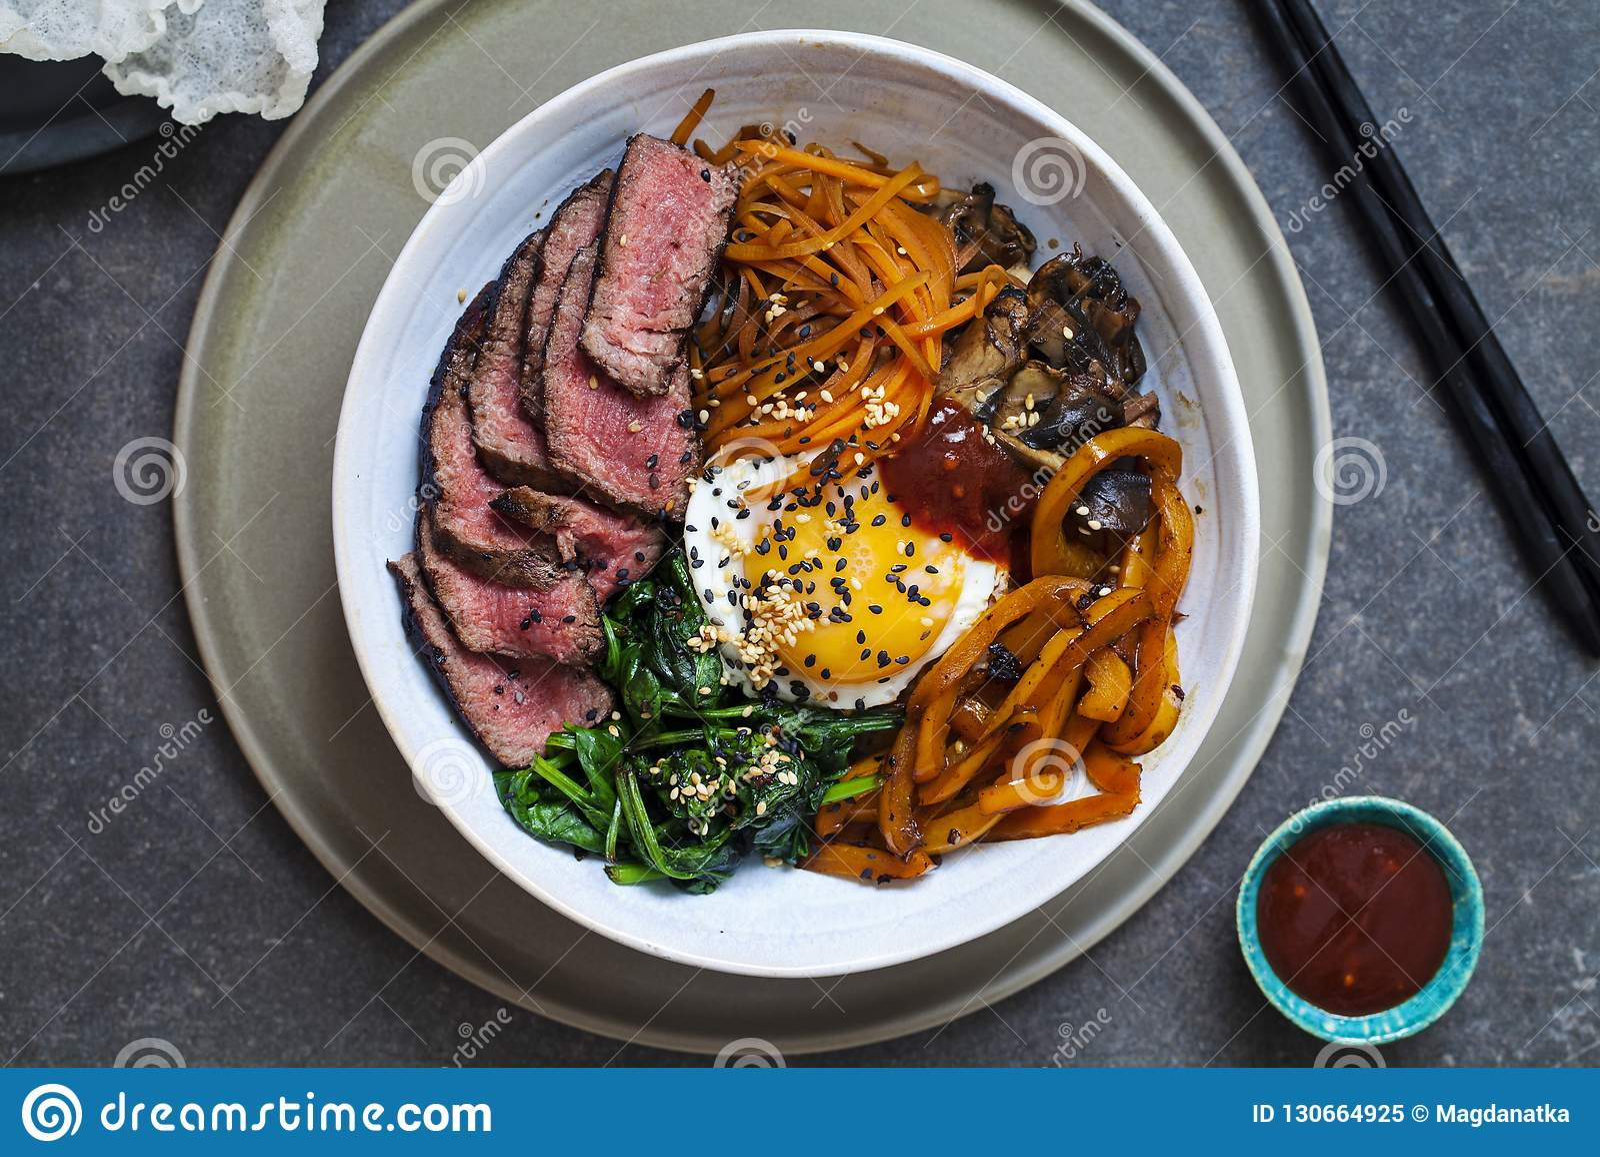 Bibimbap, Korean beef and vegetables